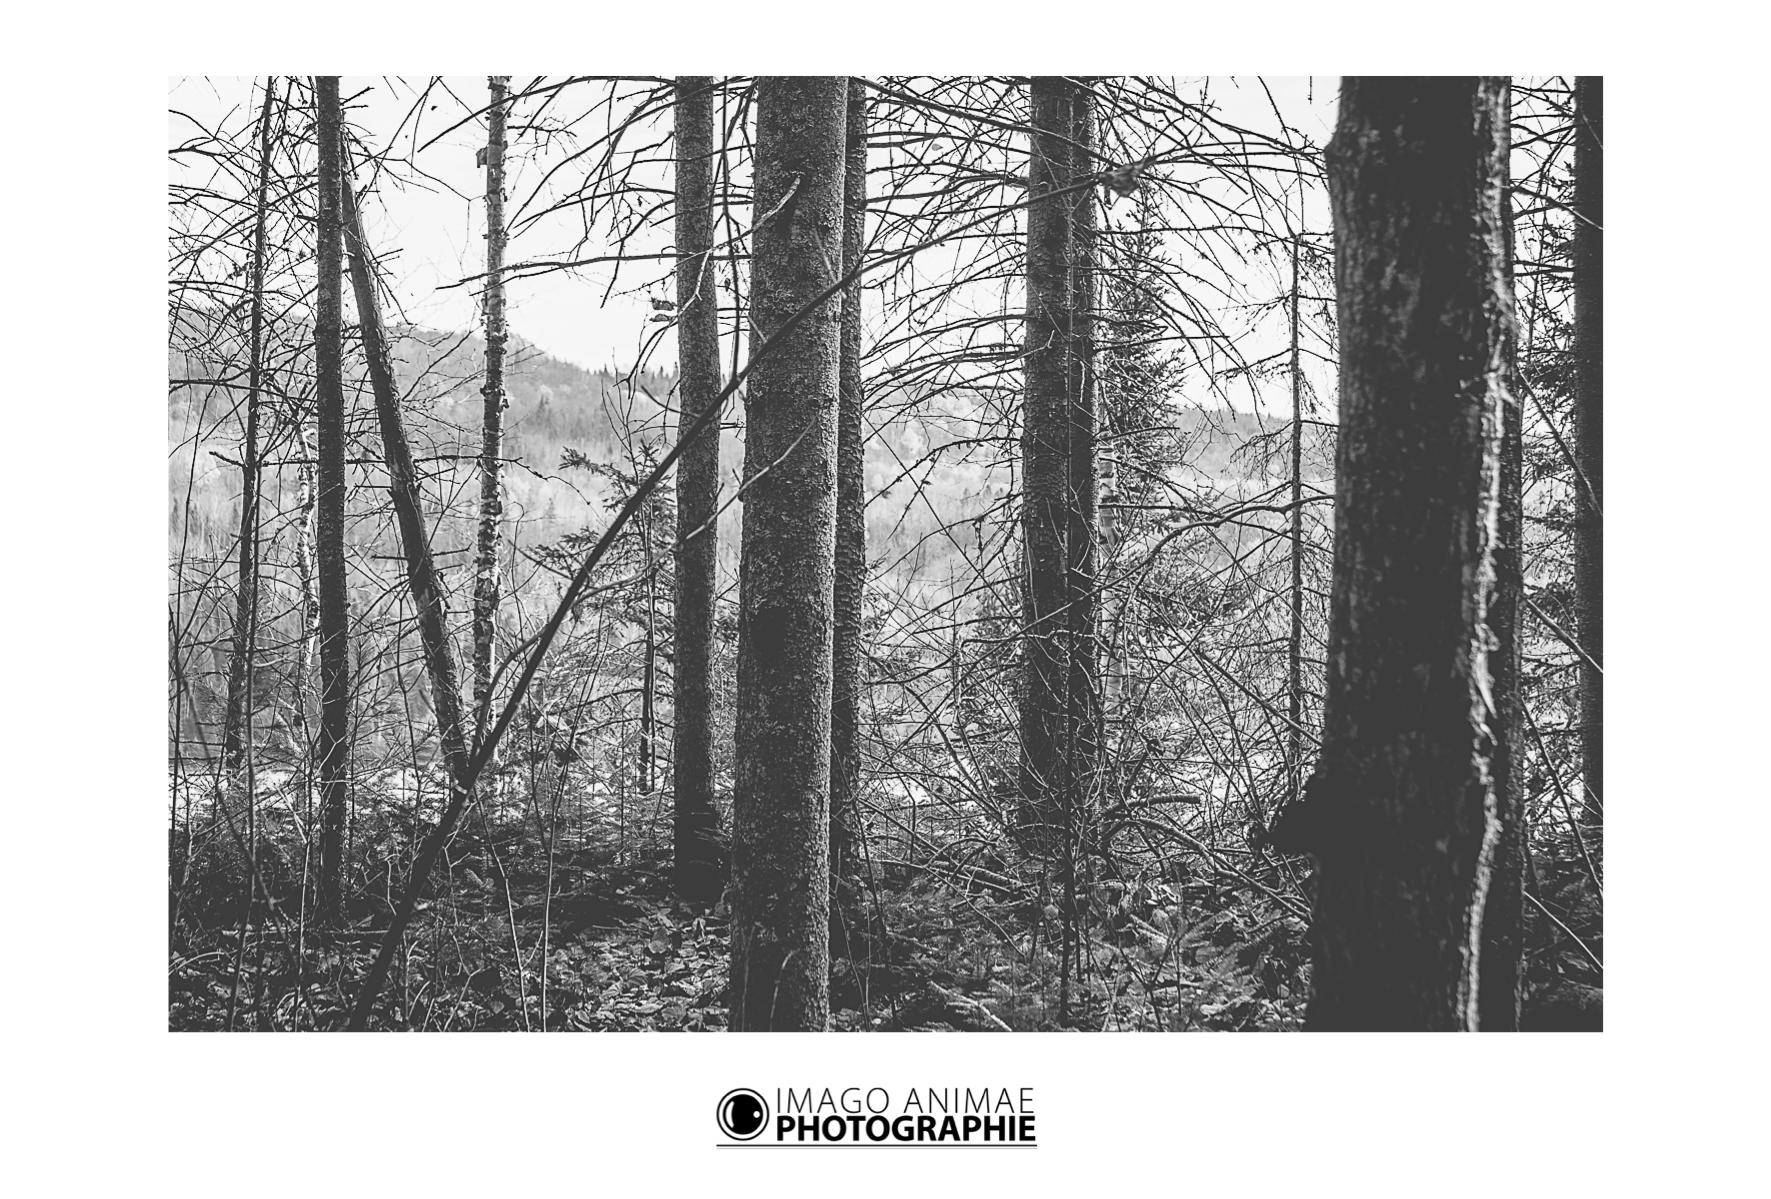 Christophe CAMPS - Imago Animae photographie - Voyage Canada Québec